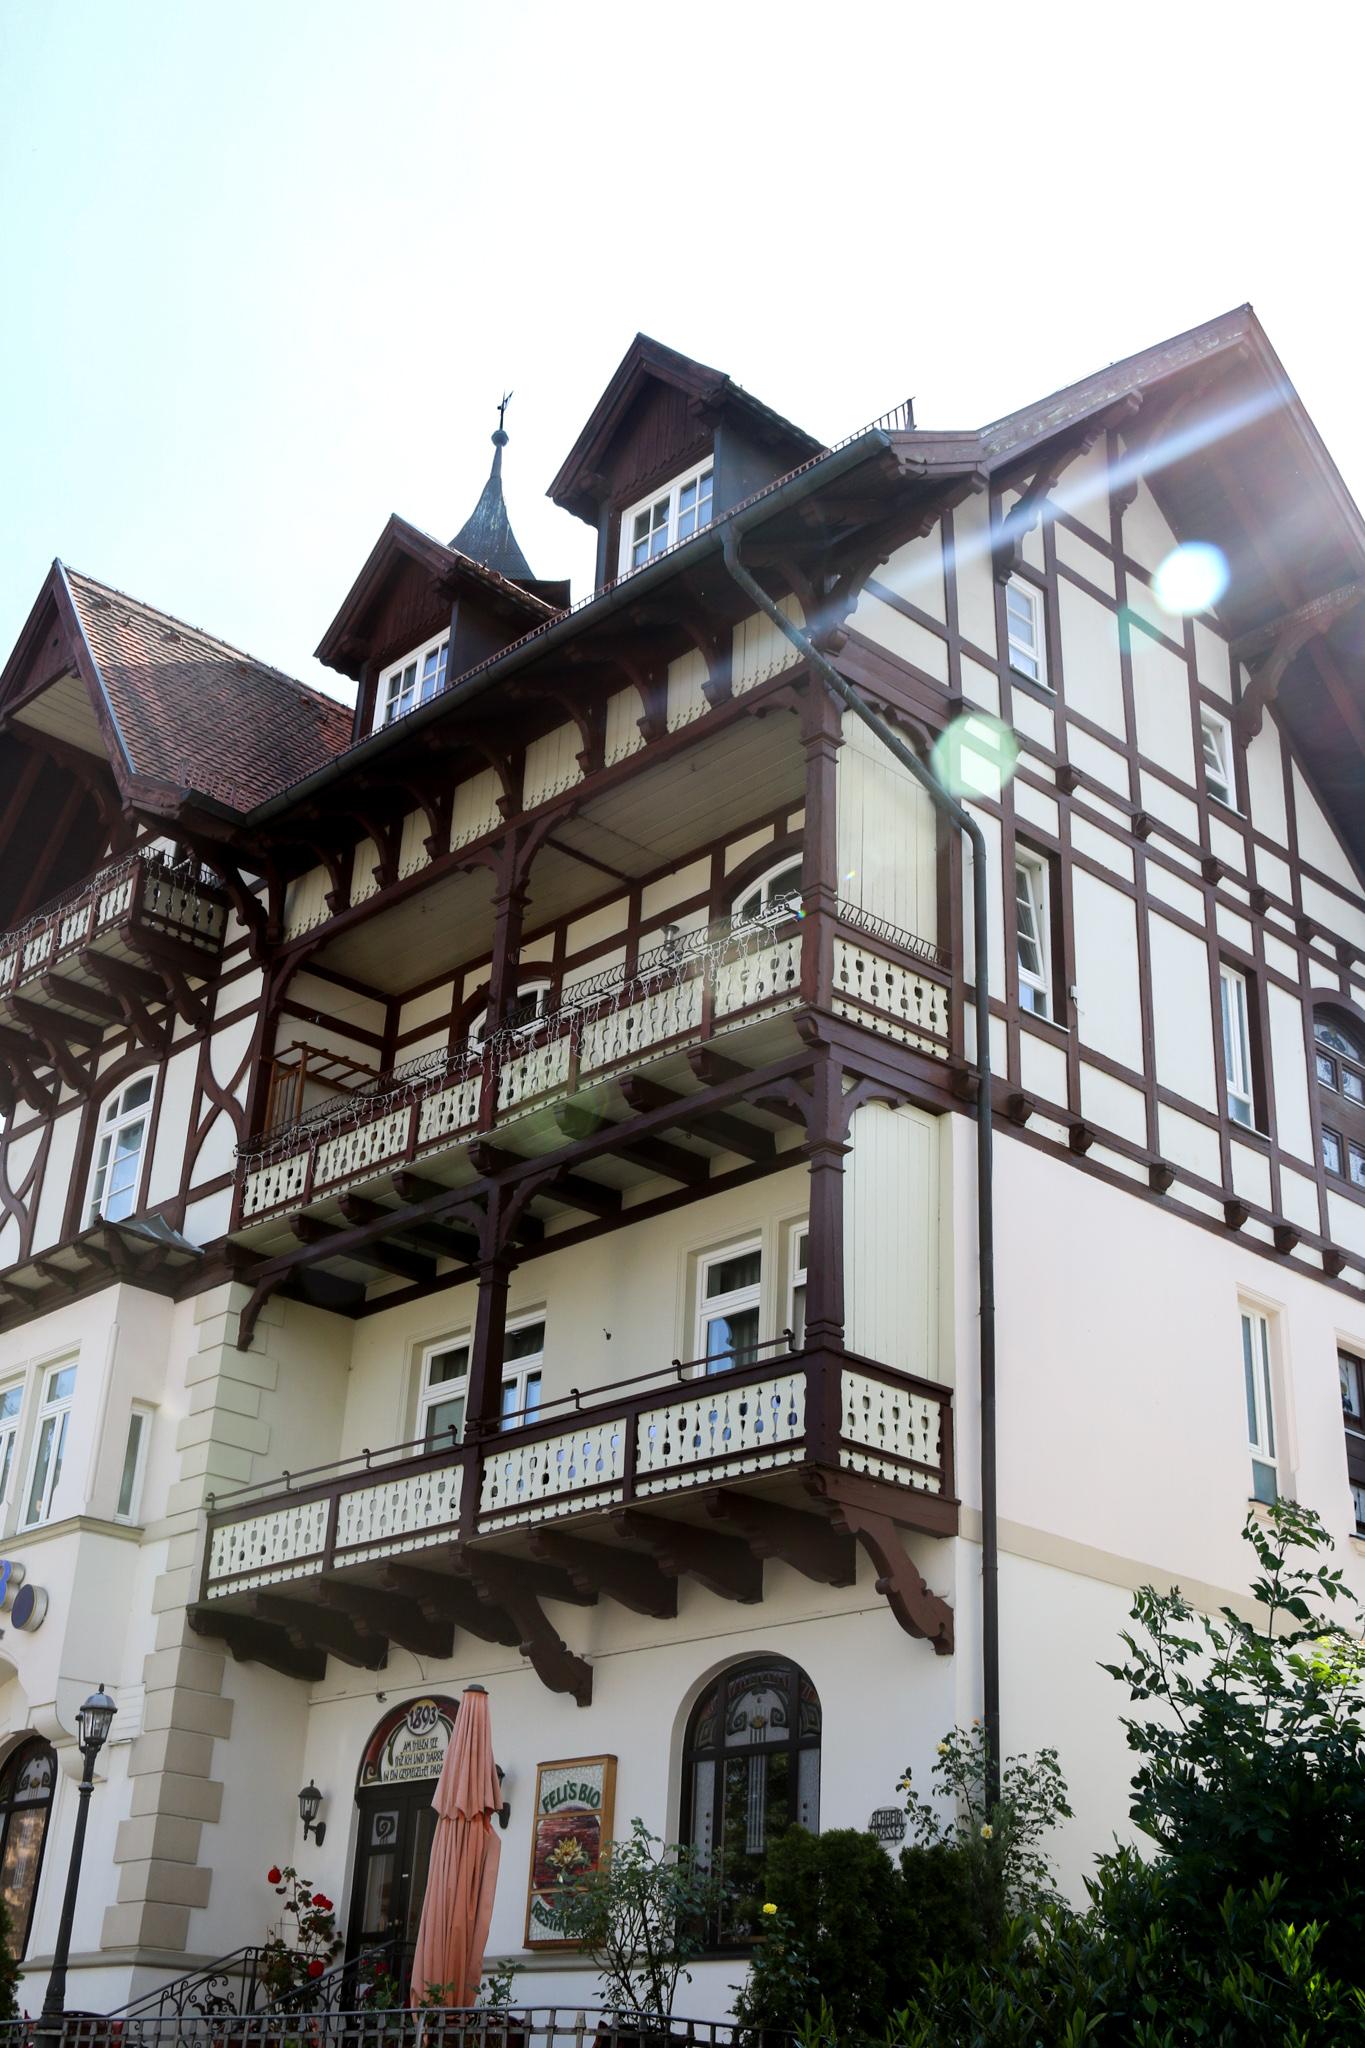 Wetter Possenhofen